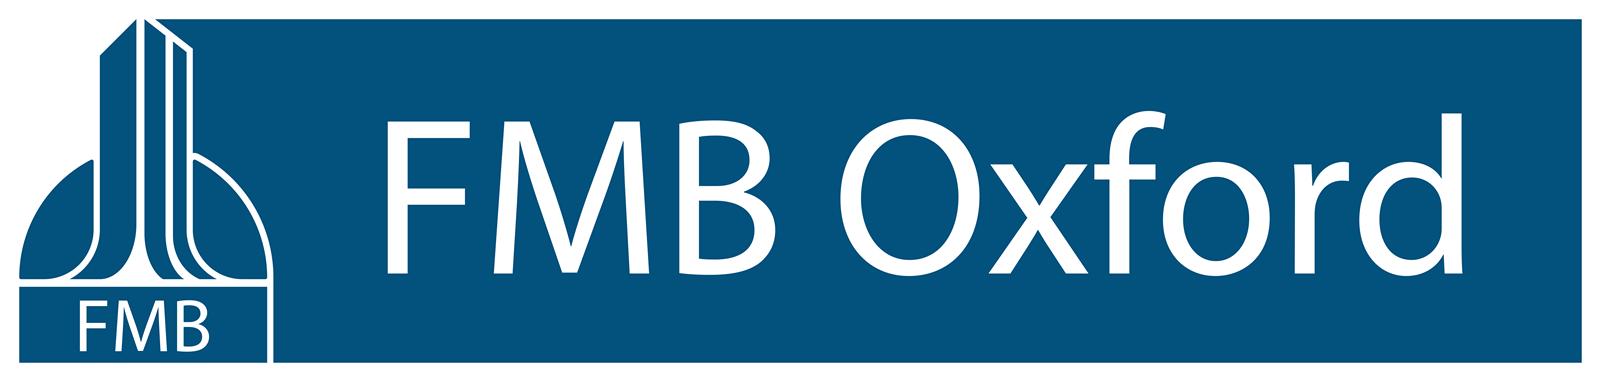 FMB Oxford logo